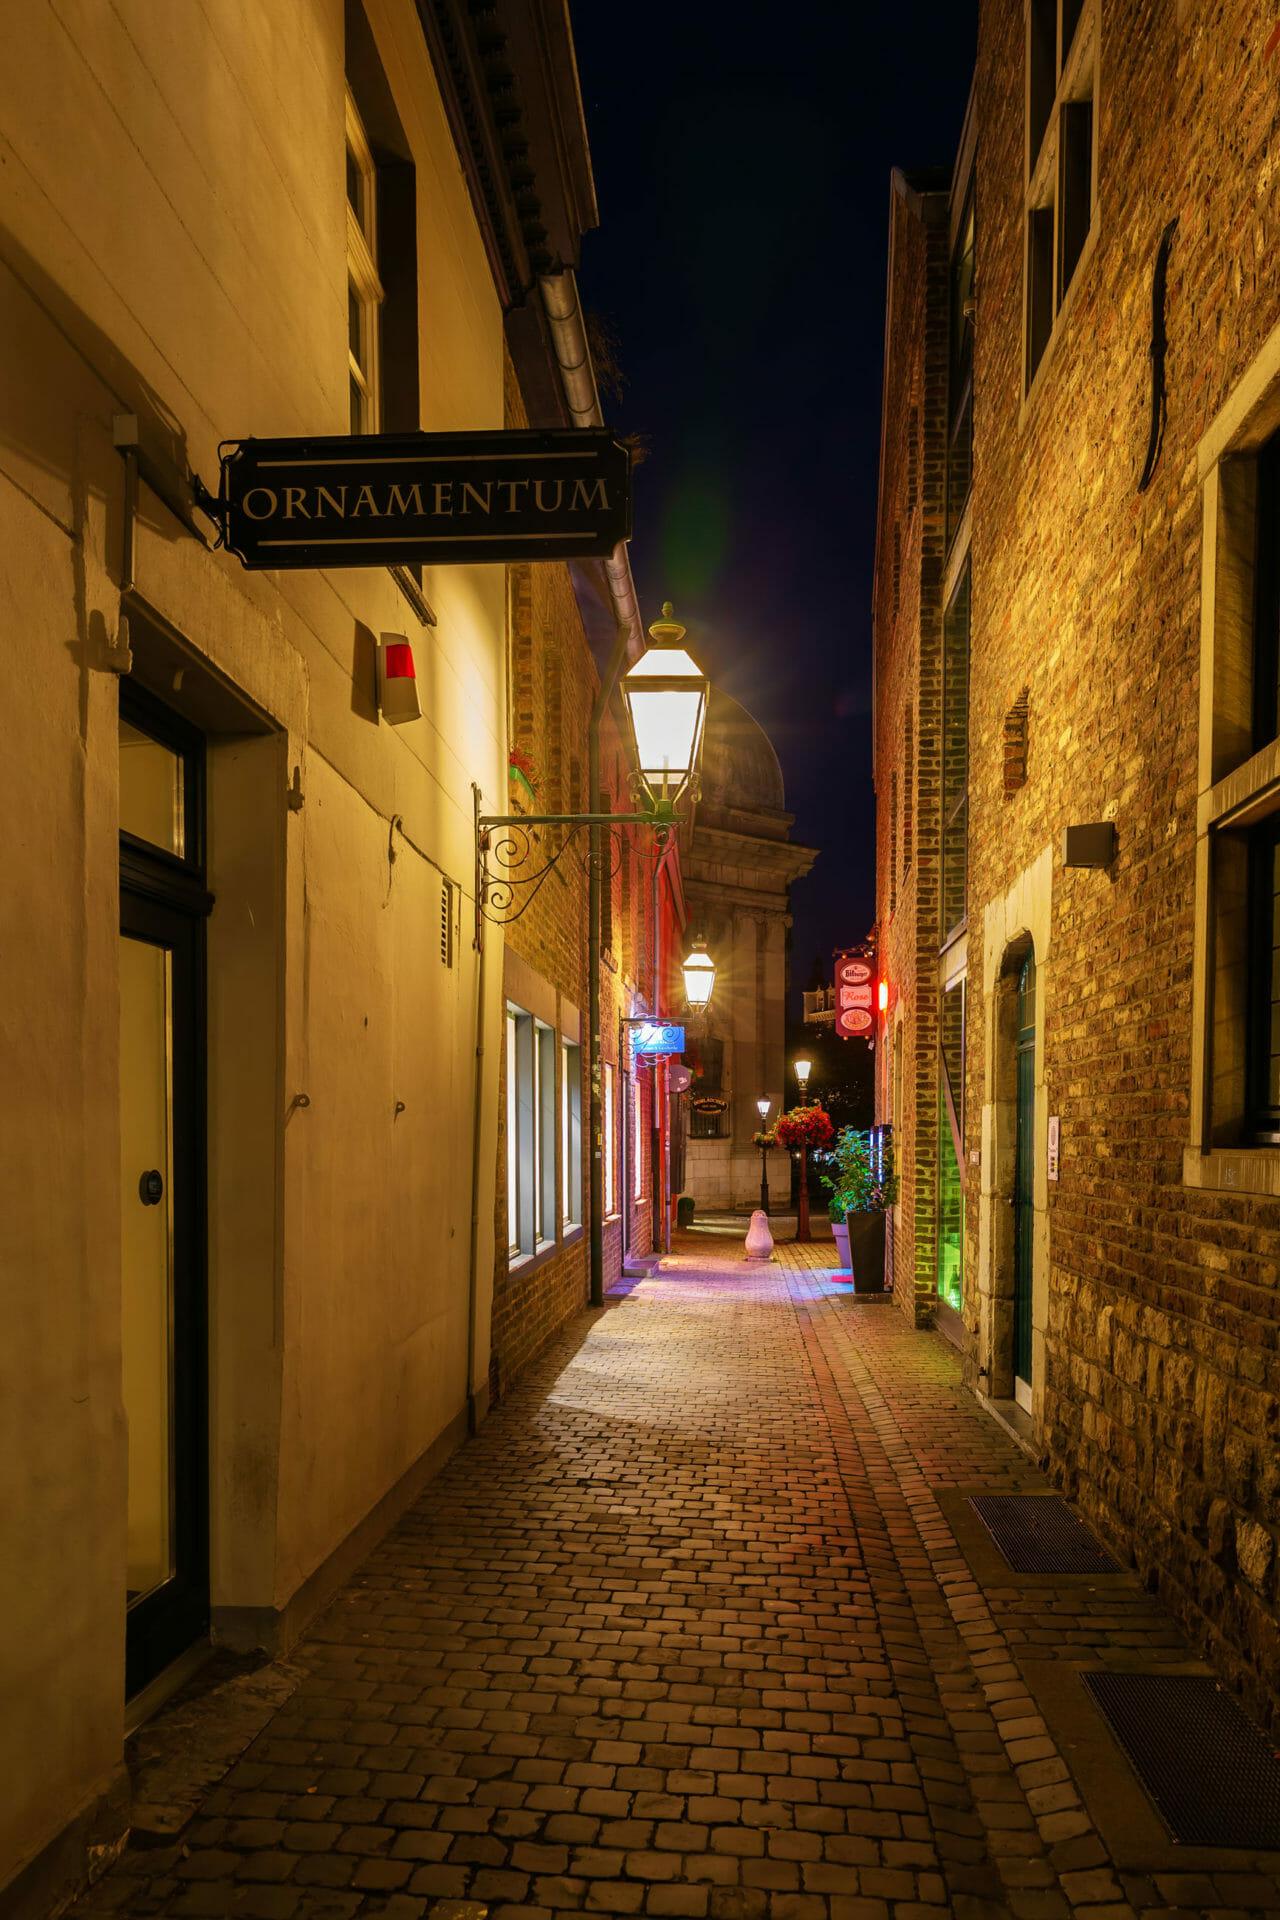 Berufsberatung in Aachen - Aachen Nachtbild